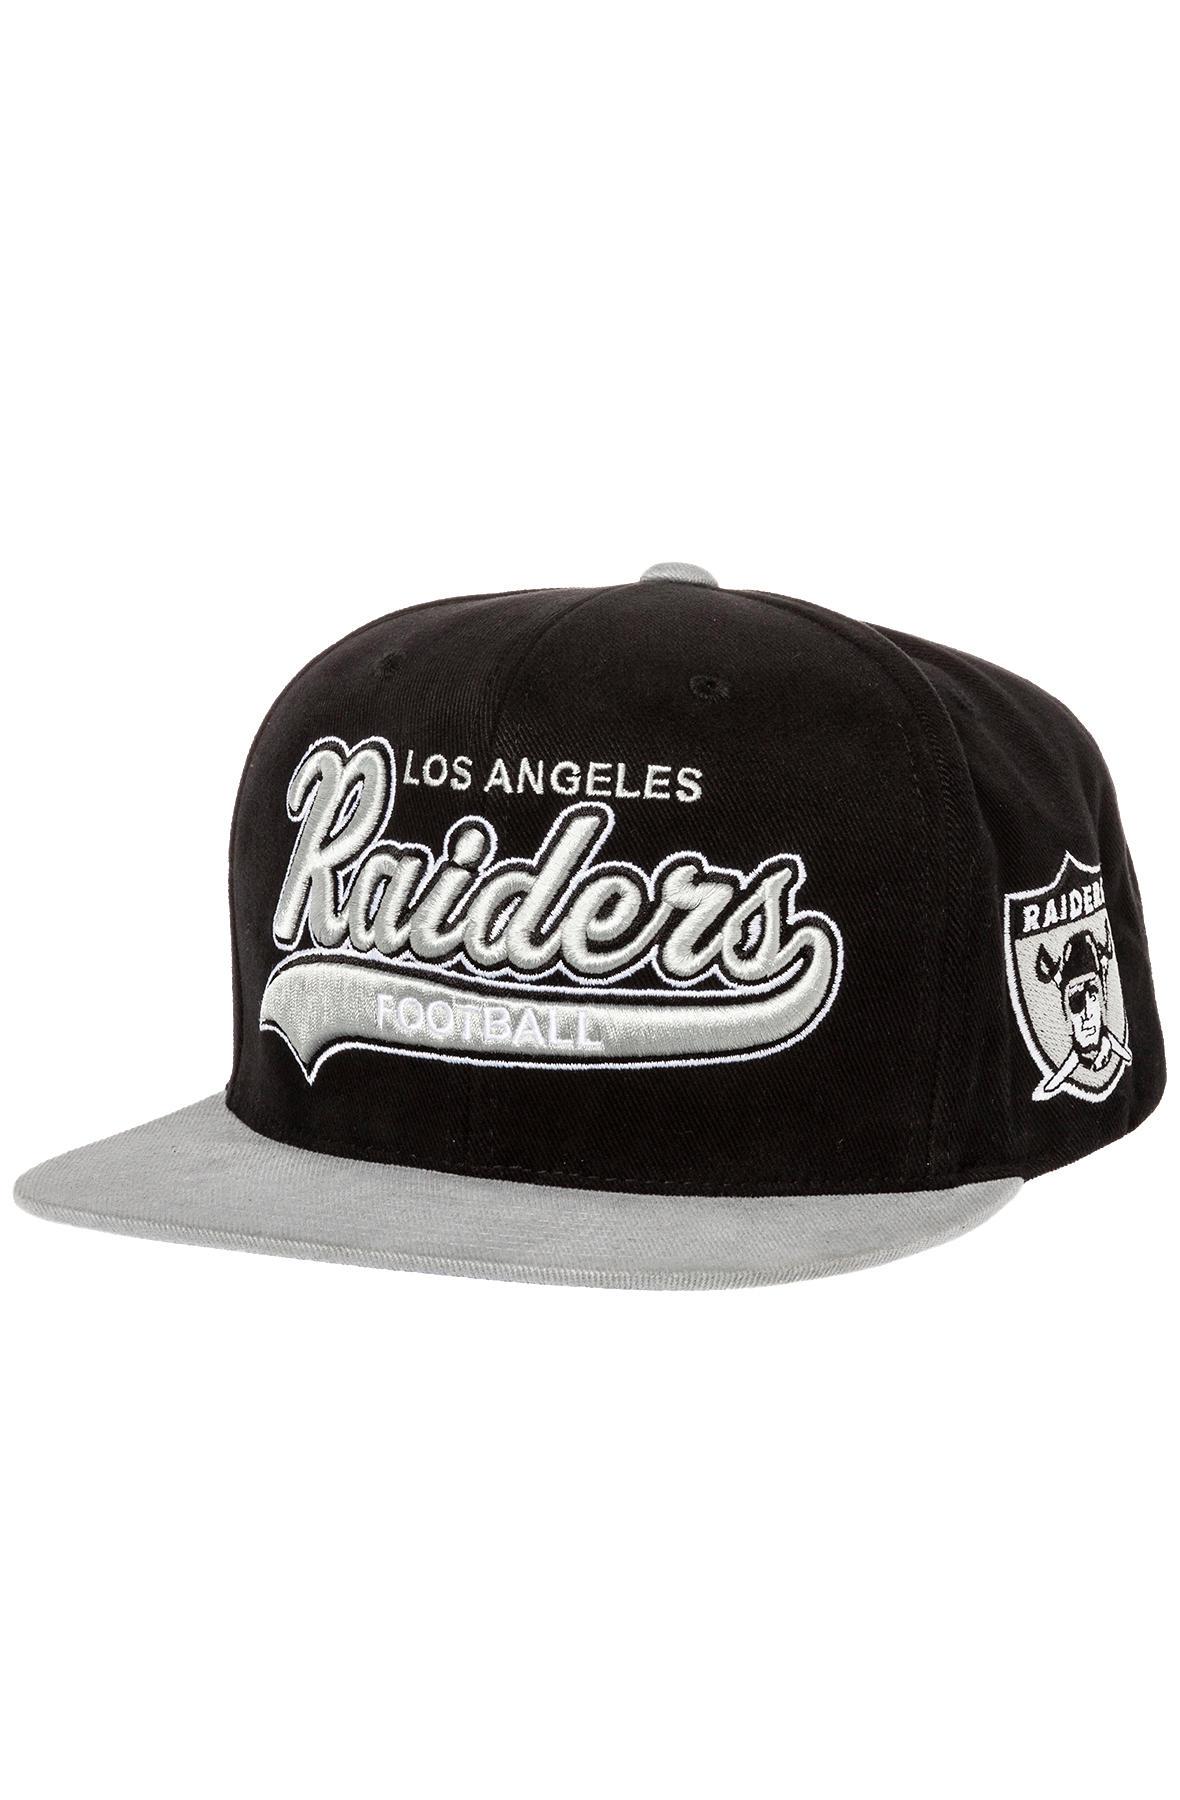 0516a724440 Lyst - Mitchell   Ness The Oakland Raiders Xl Logo 2tone Snapback ...